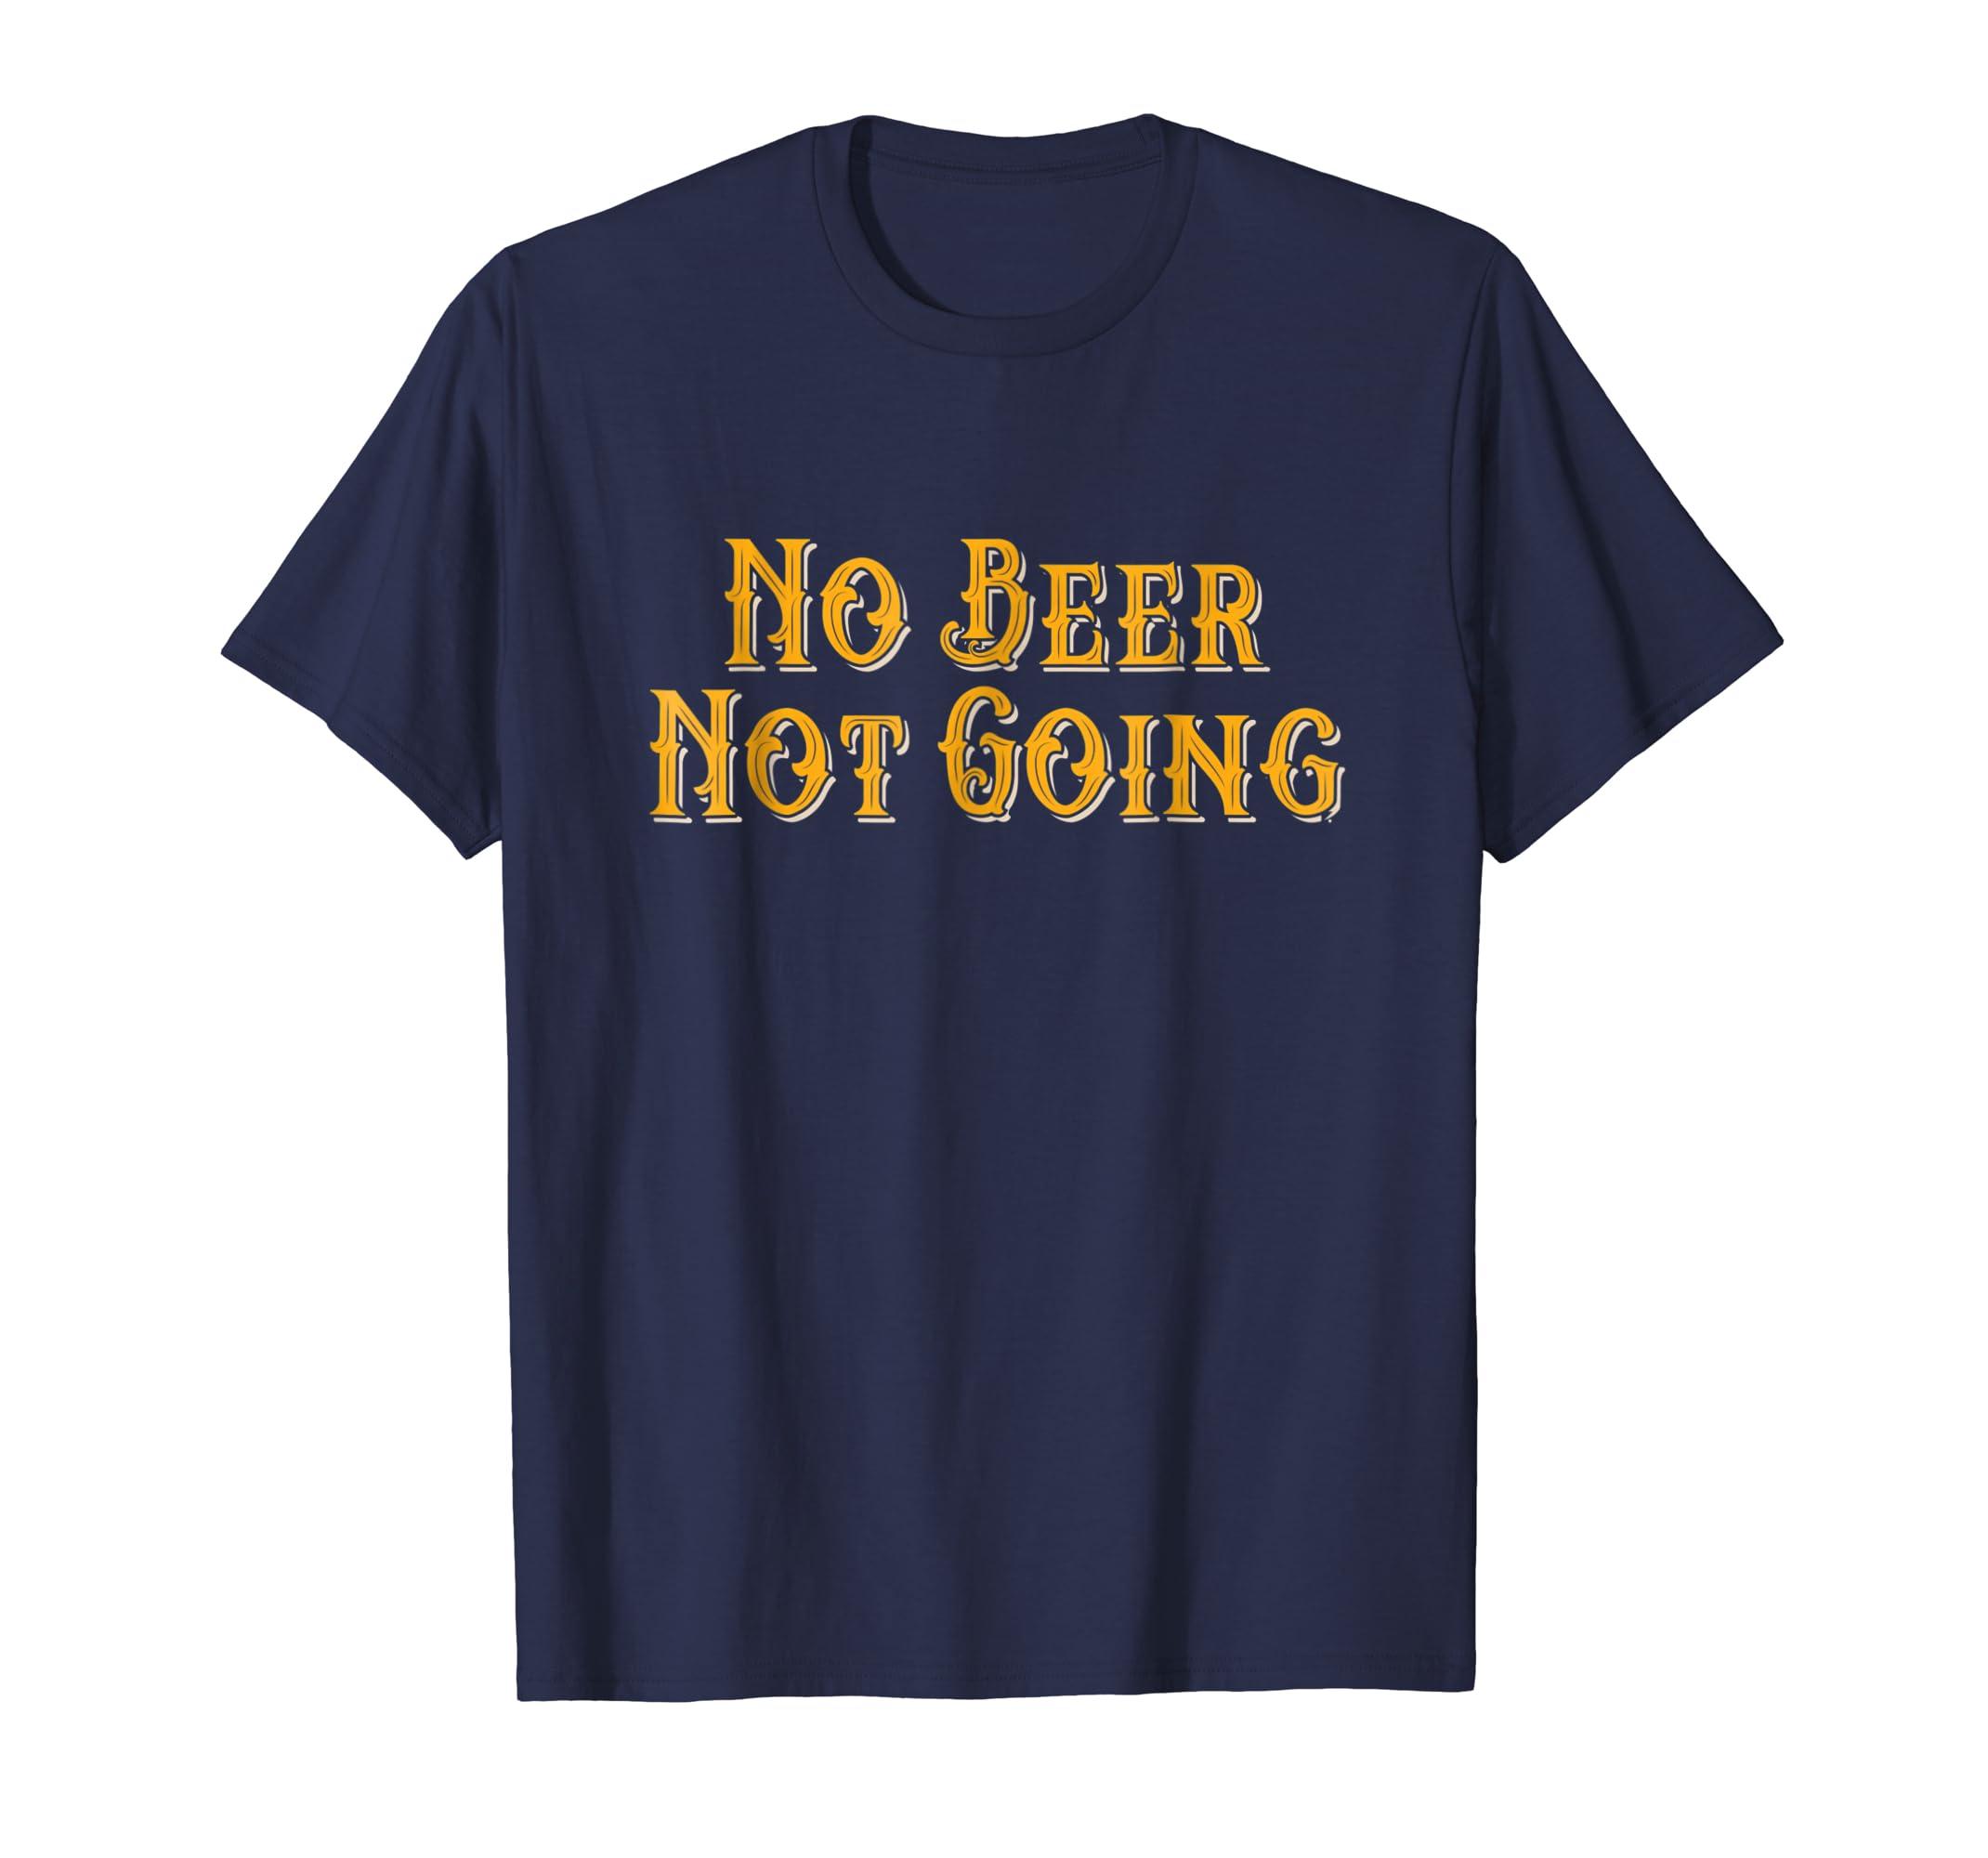 'No Beer Not Going' International Beer Day Shirt-AZP